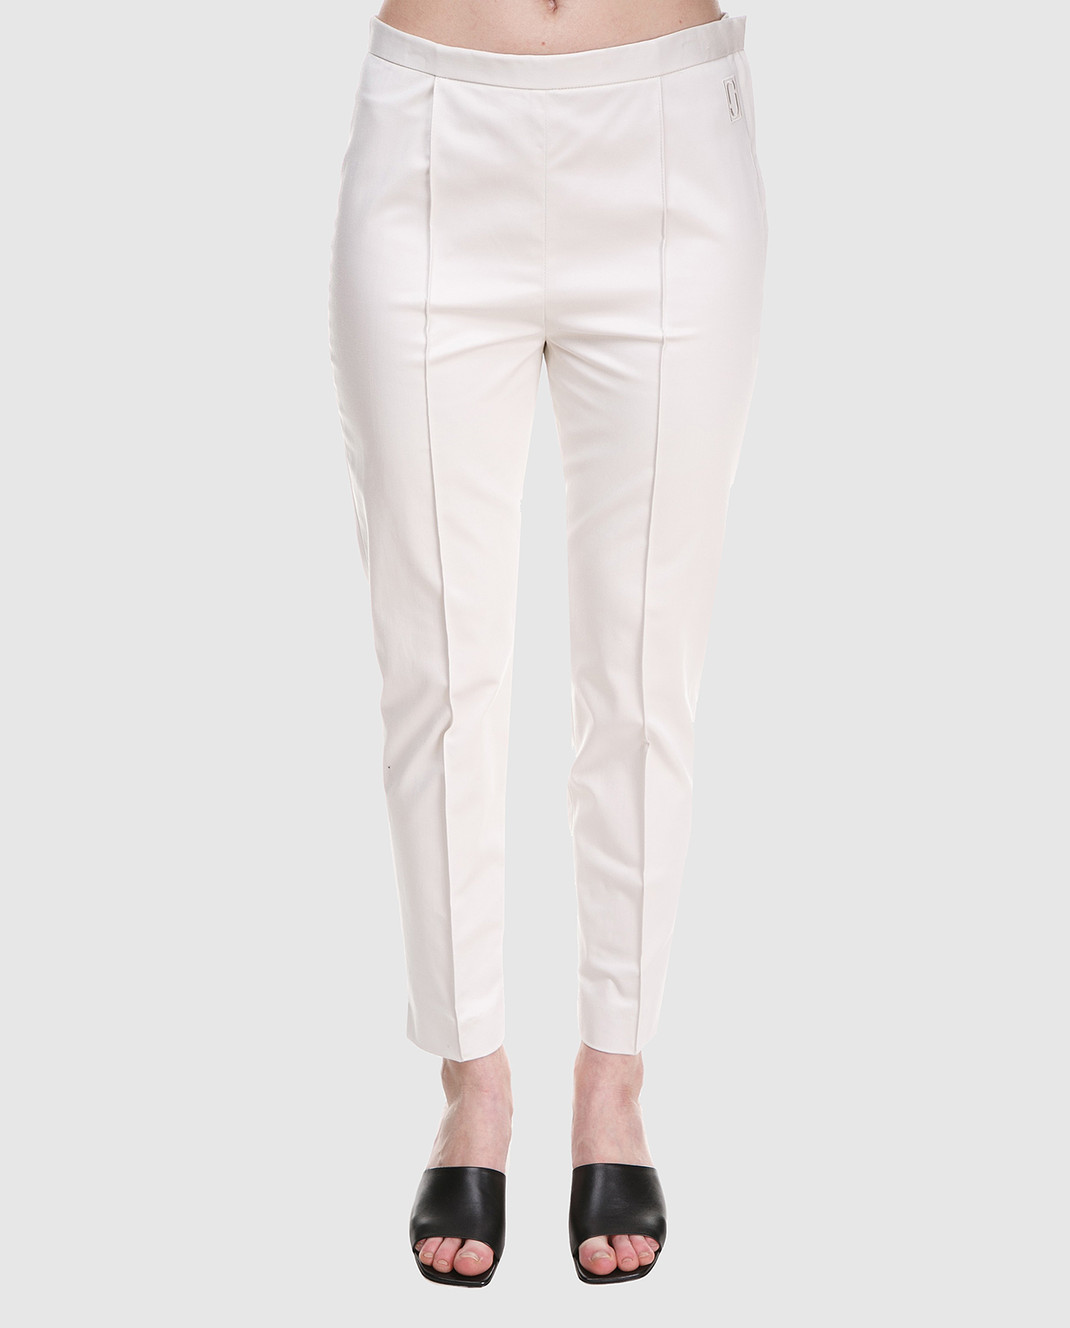 Marc Jacobs Белые брюки M4007166 изображение 3